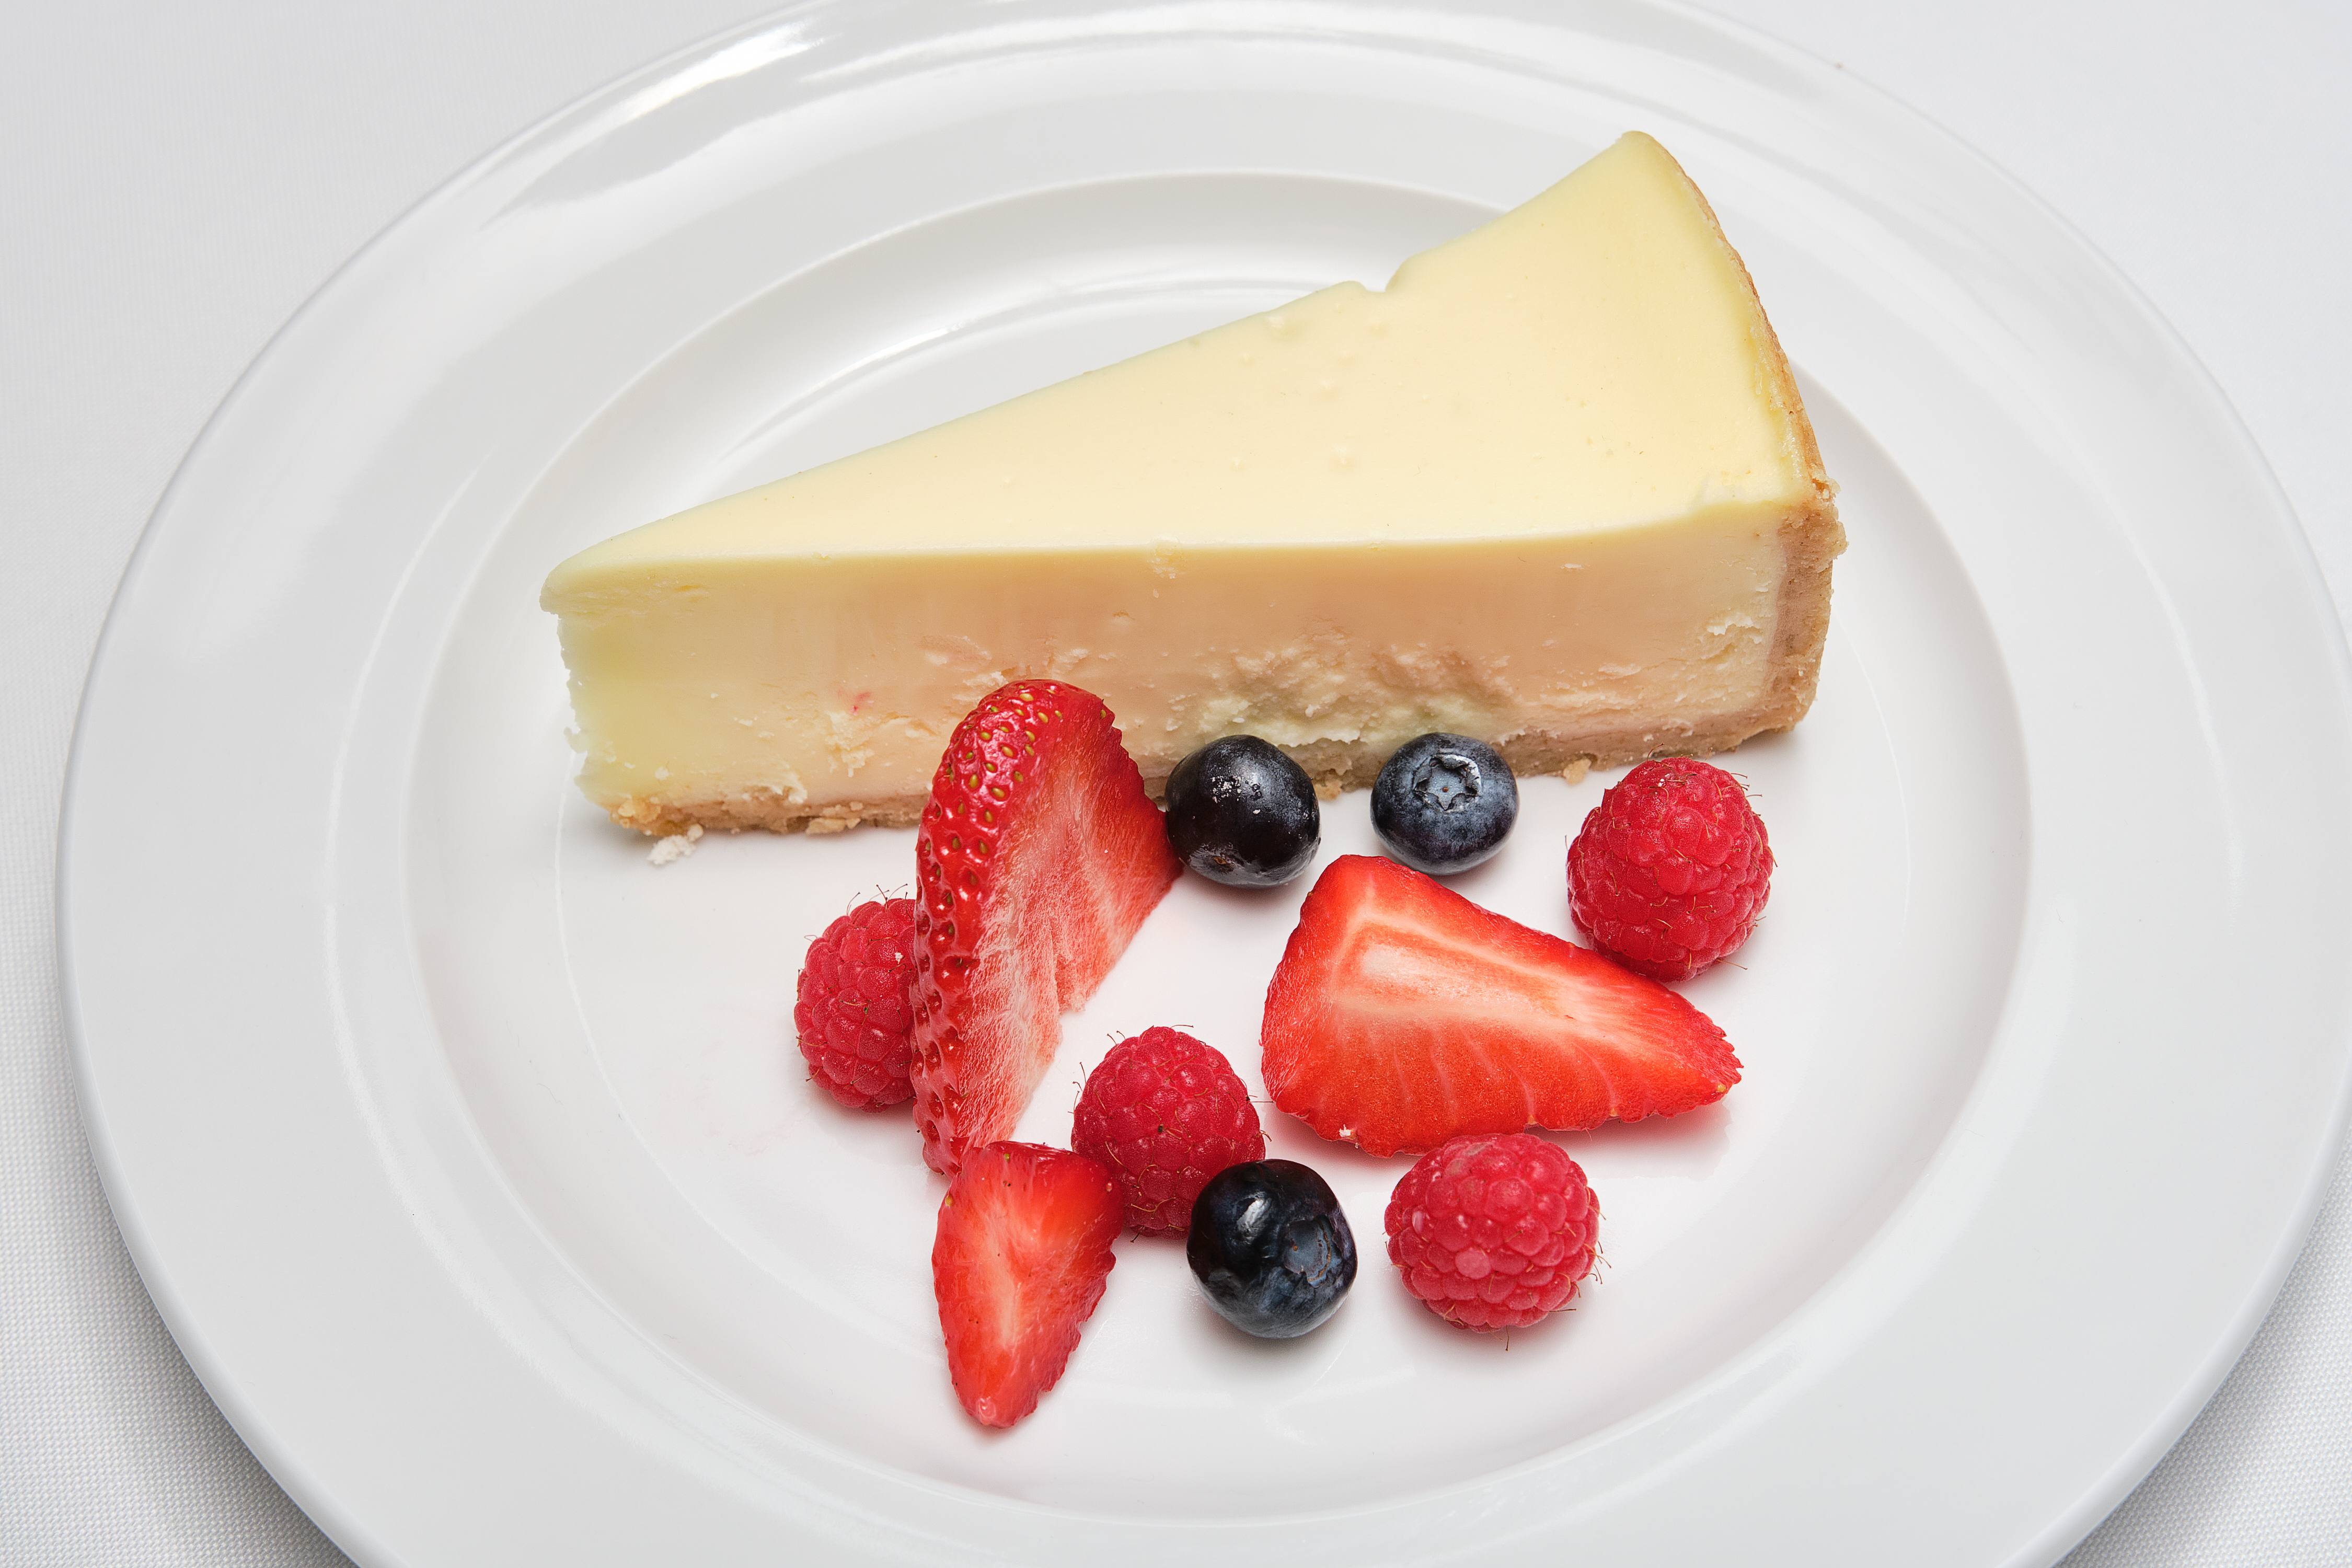 031620-04-Dessert-Baked-Vanilla-Bean-Che